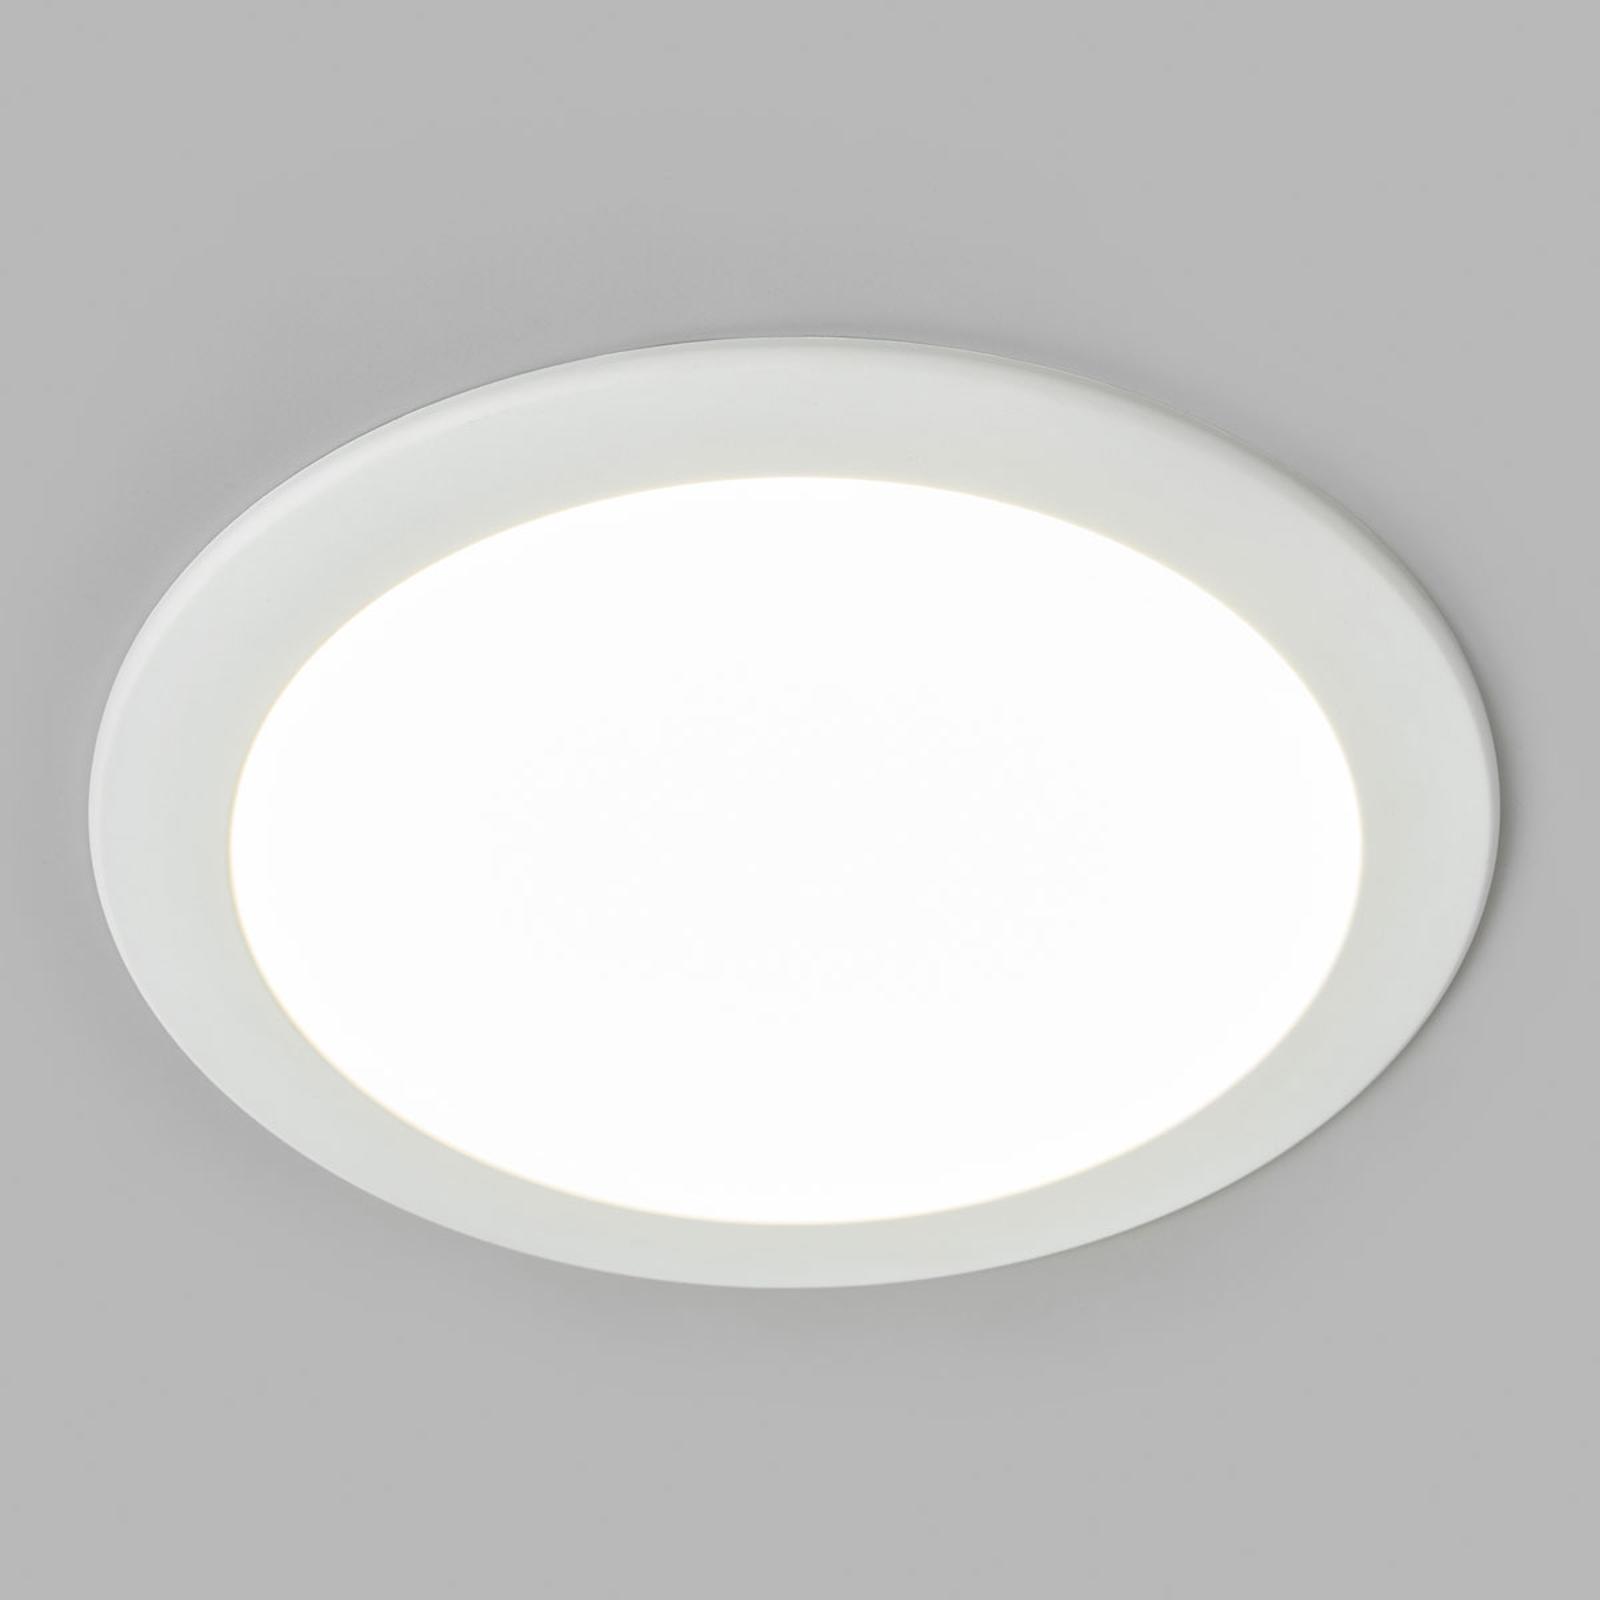 LED-Einbaustrahler Joki weiß 4000K rund 24cm